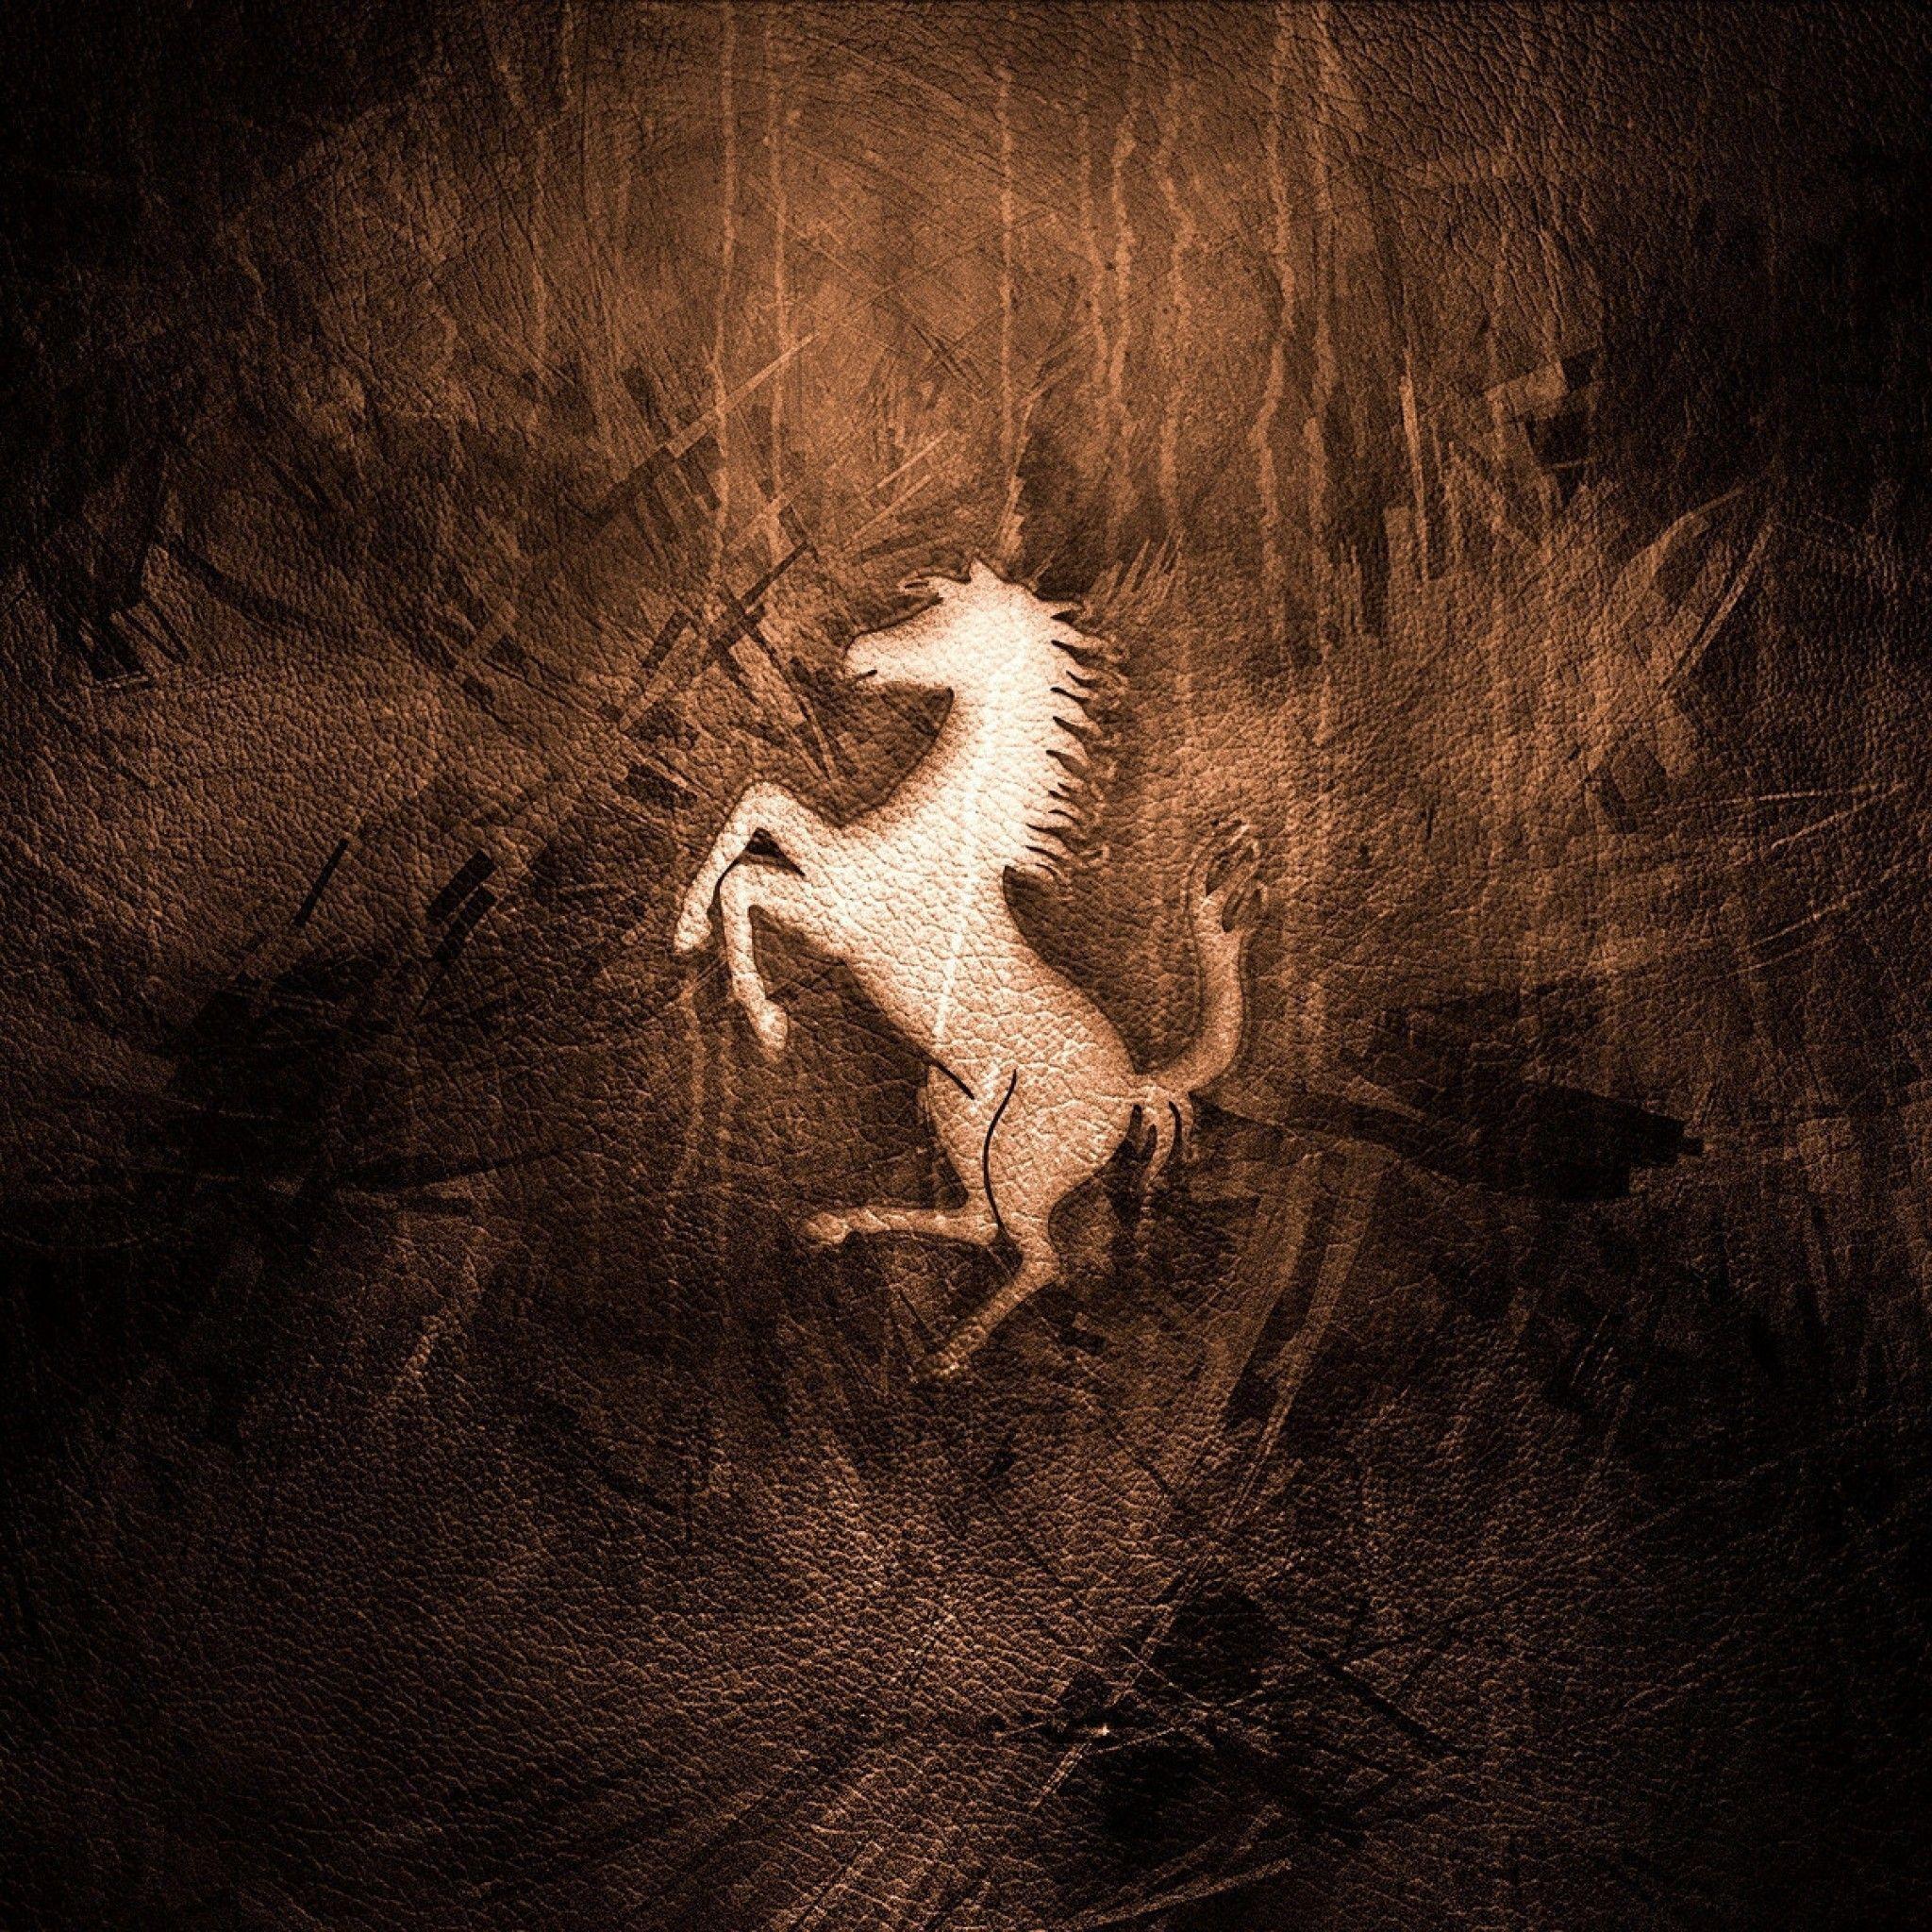 Good Wallpaper Horse Iphone 5s - b2aa5ab6171473a86d1847925bc51df7  Graphic_604444.jpg